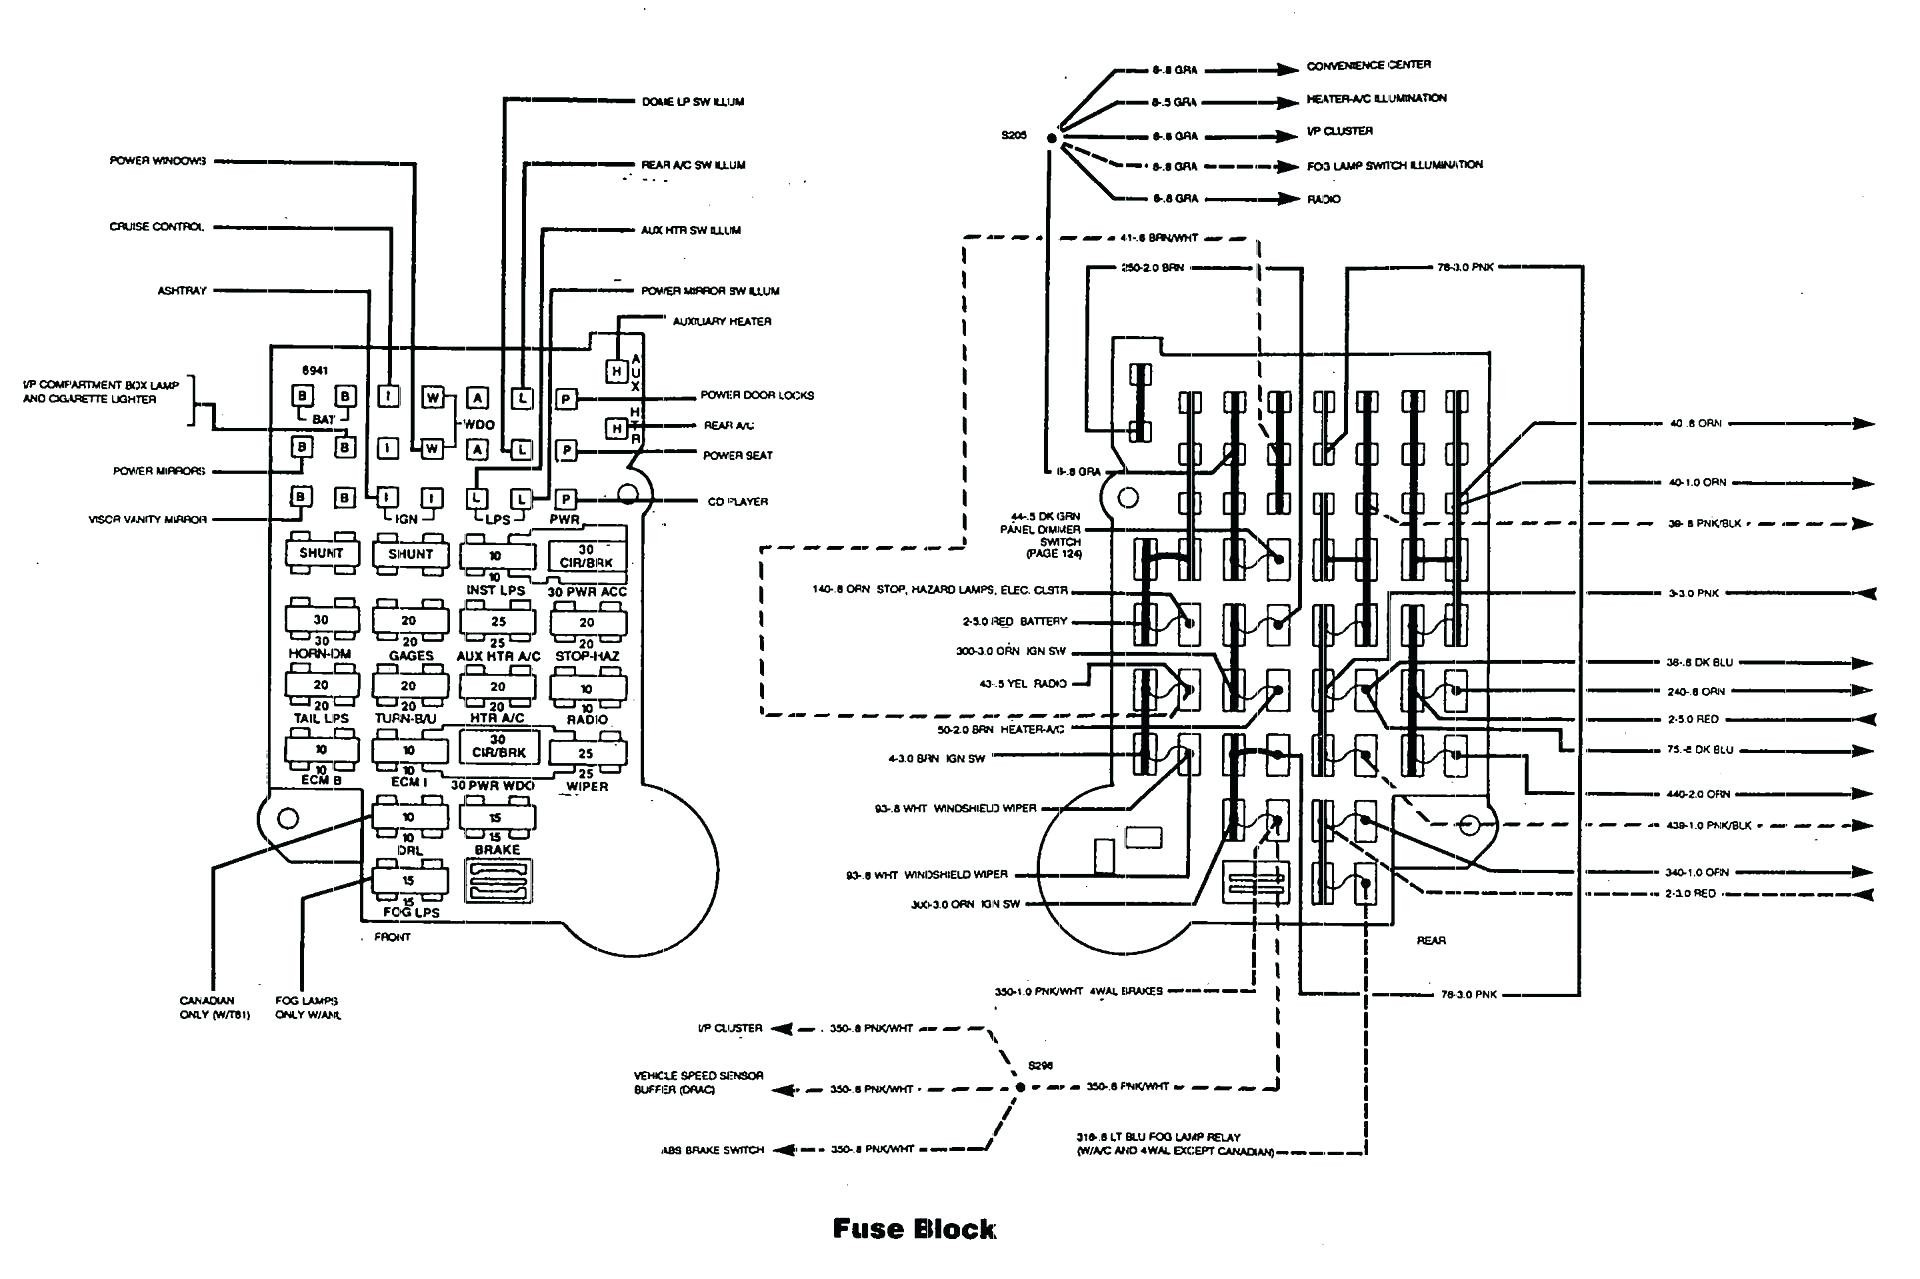 1998 ford Mustang Wiring Diagram 1998 Pontiac Grand Prix Wiring Diagram Wiring Data Of 1998 ford Mustang Wiring Diagram